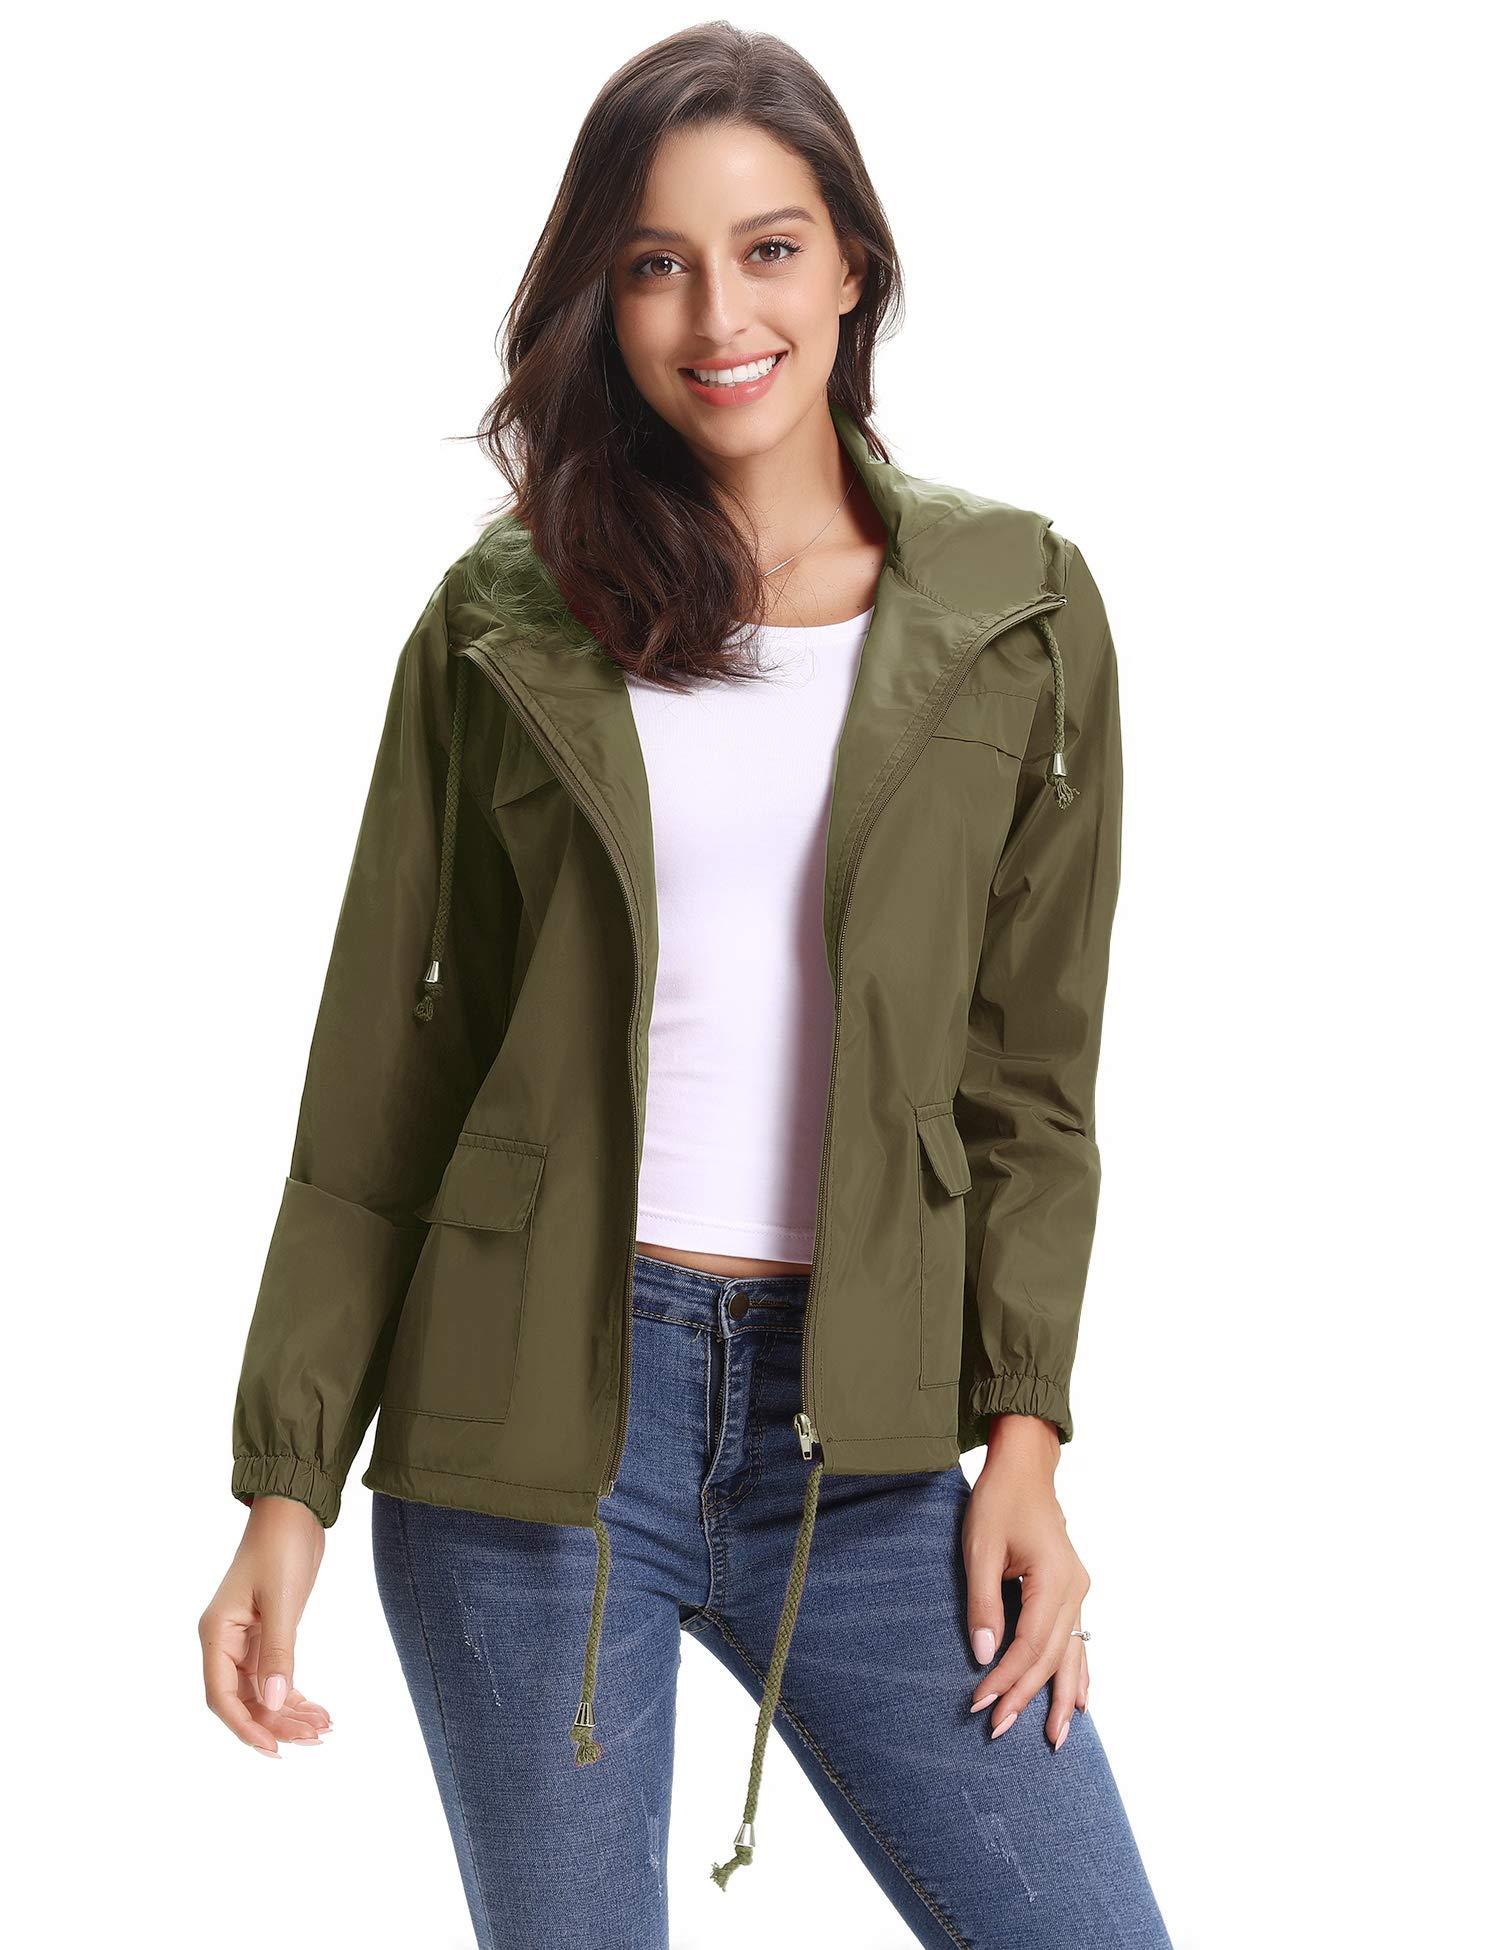 Abollria Women Lightweight Waterproof Raincoat Windbreaker Rain Jacket Outdoor Hooded Trench Coats